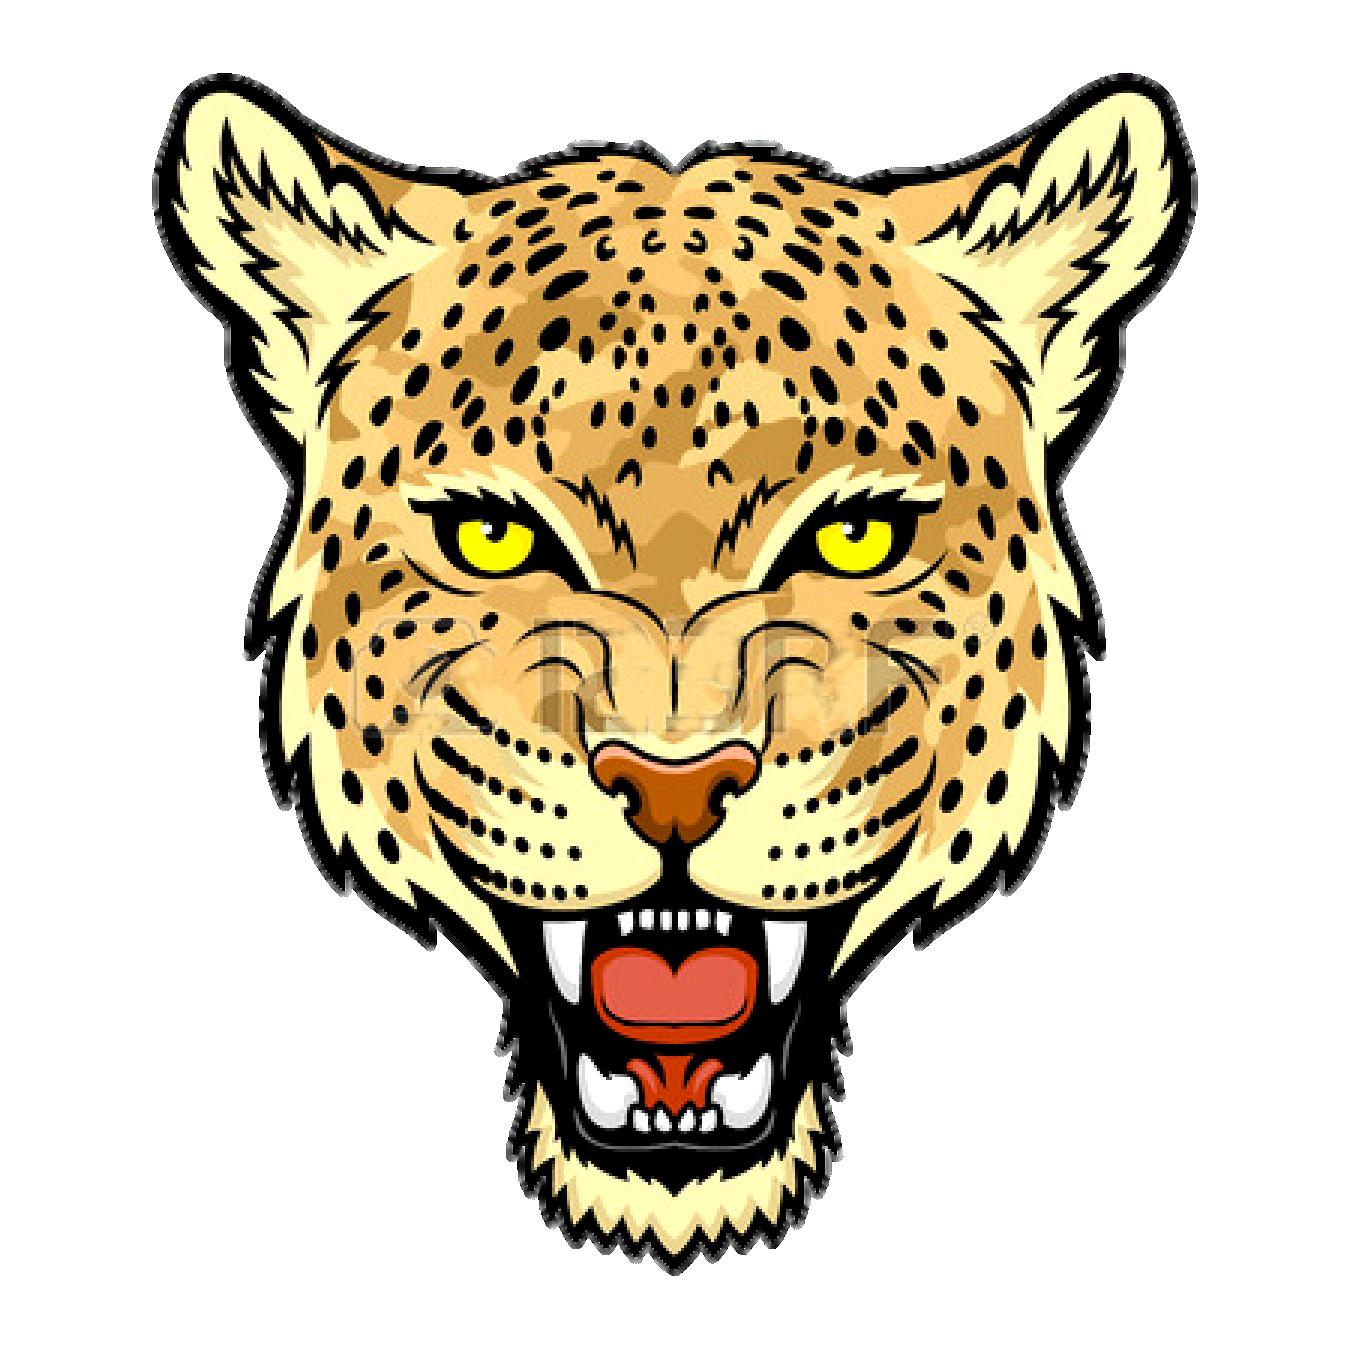 jaguar animal clipart at getdrawings com free for personal use rh getdrawings com jaguar clipart jaguar clip art face